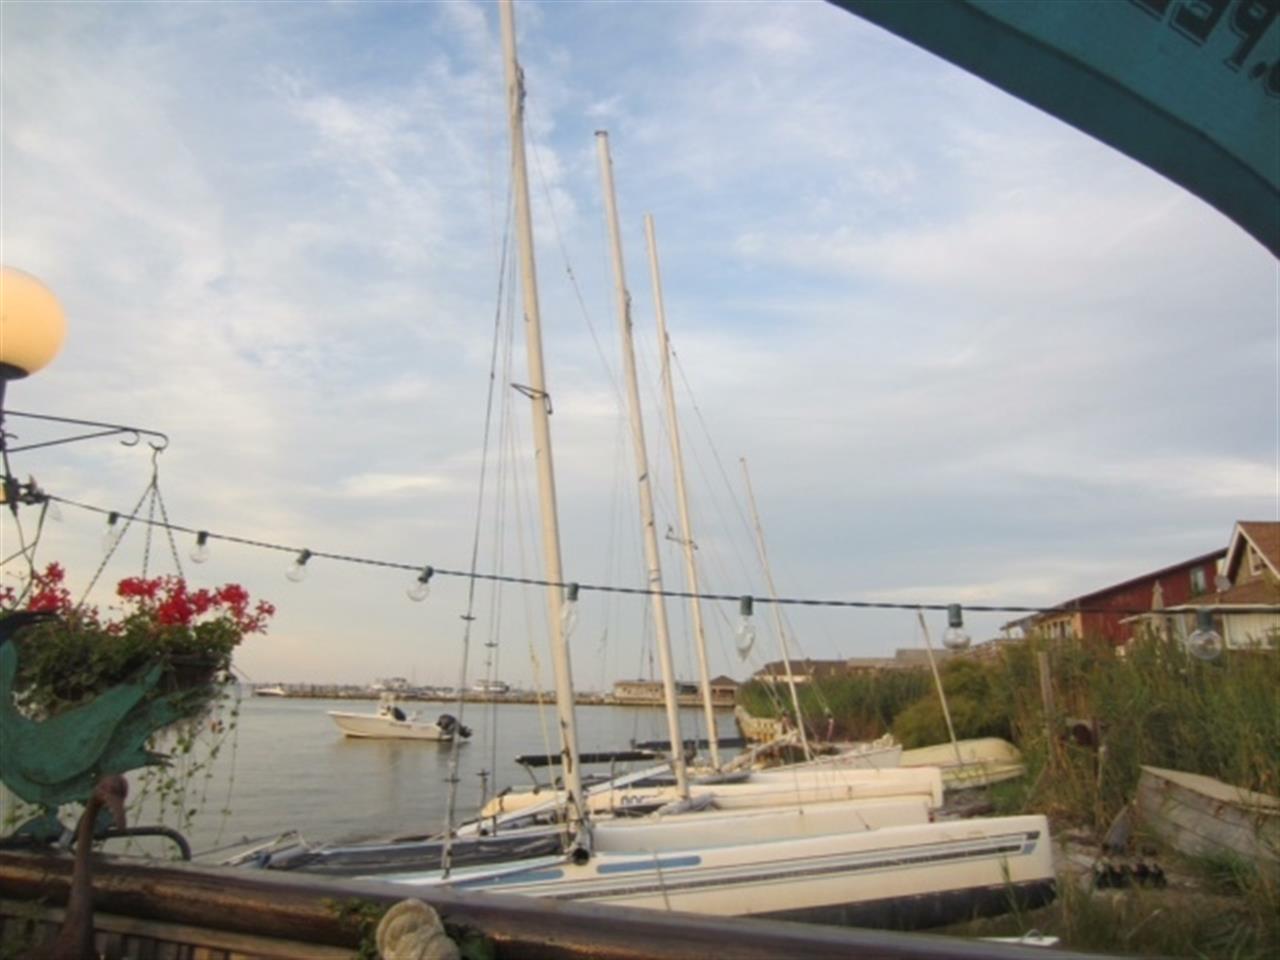 #Sailing #Boats #OceanBay #OceanBayPark #EnjoyTheViewWithUs #LeadingReLocal #SummerTime #SummerFun